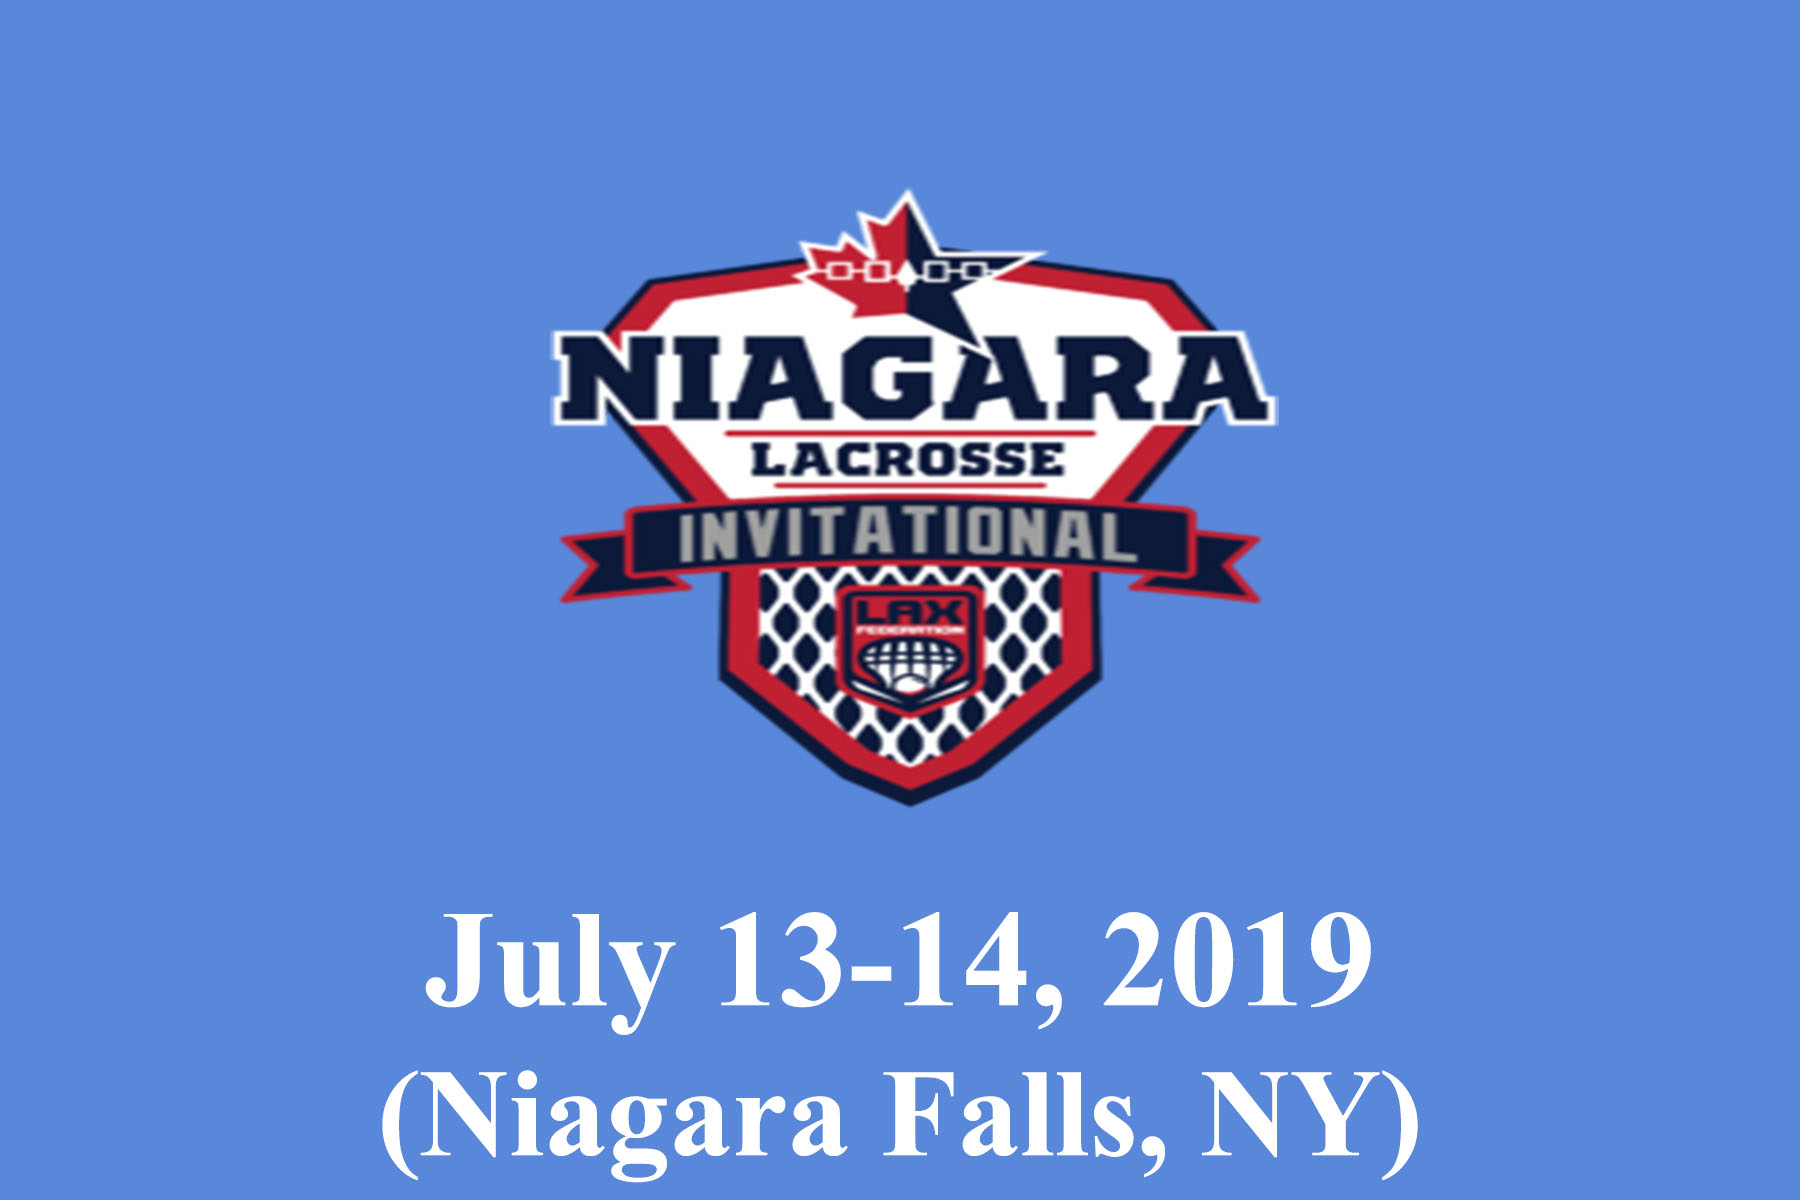 Niagara Showcase